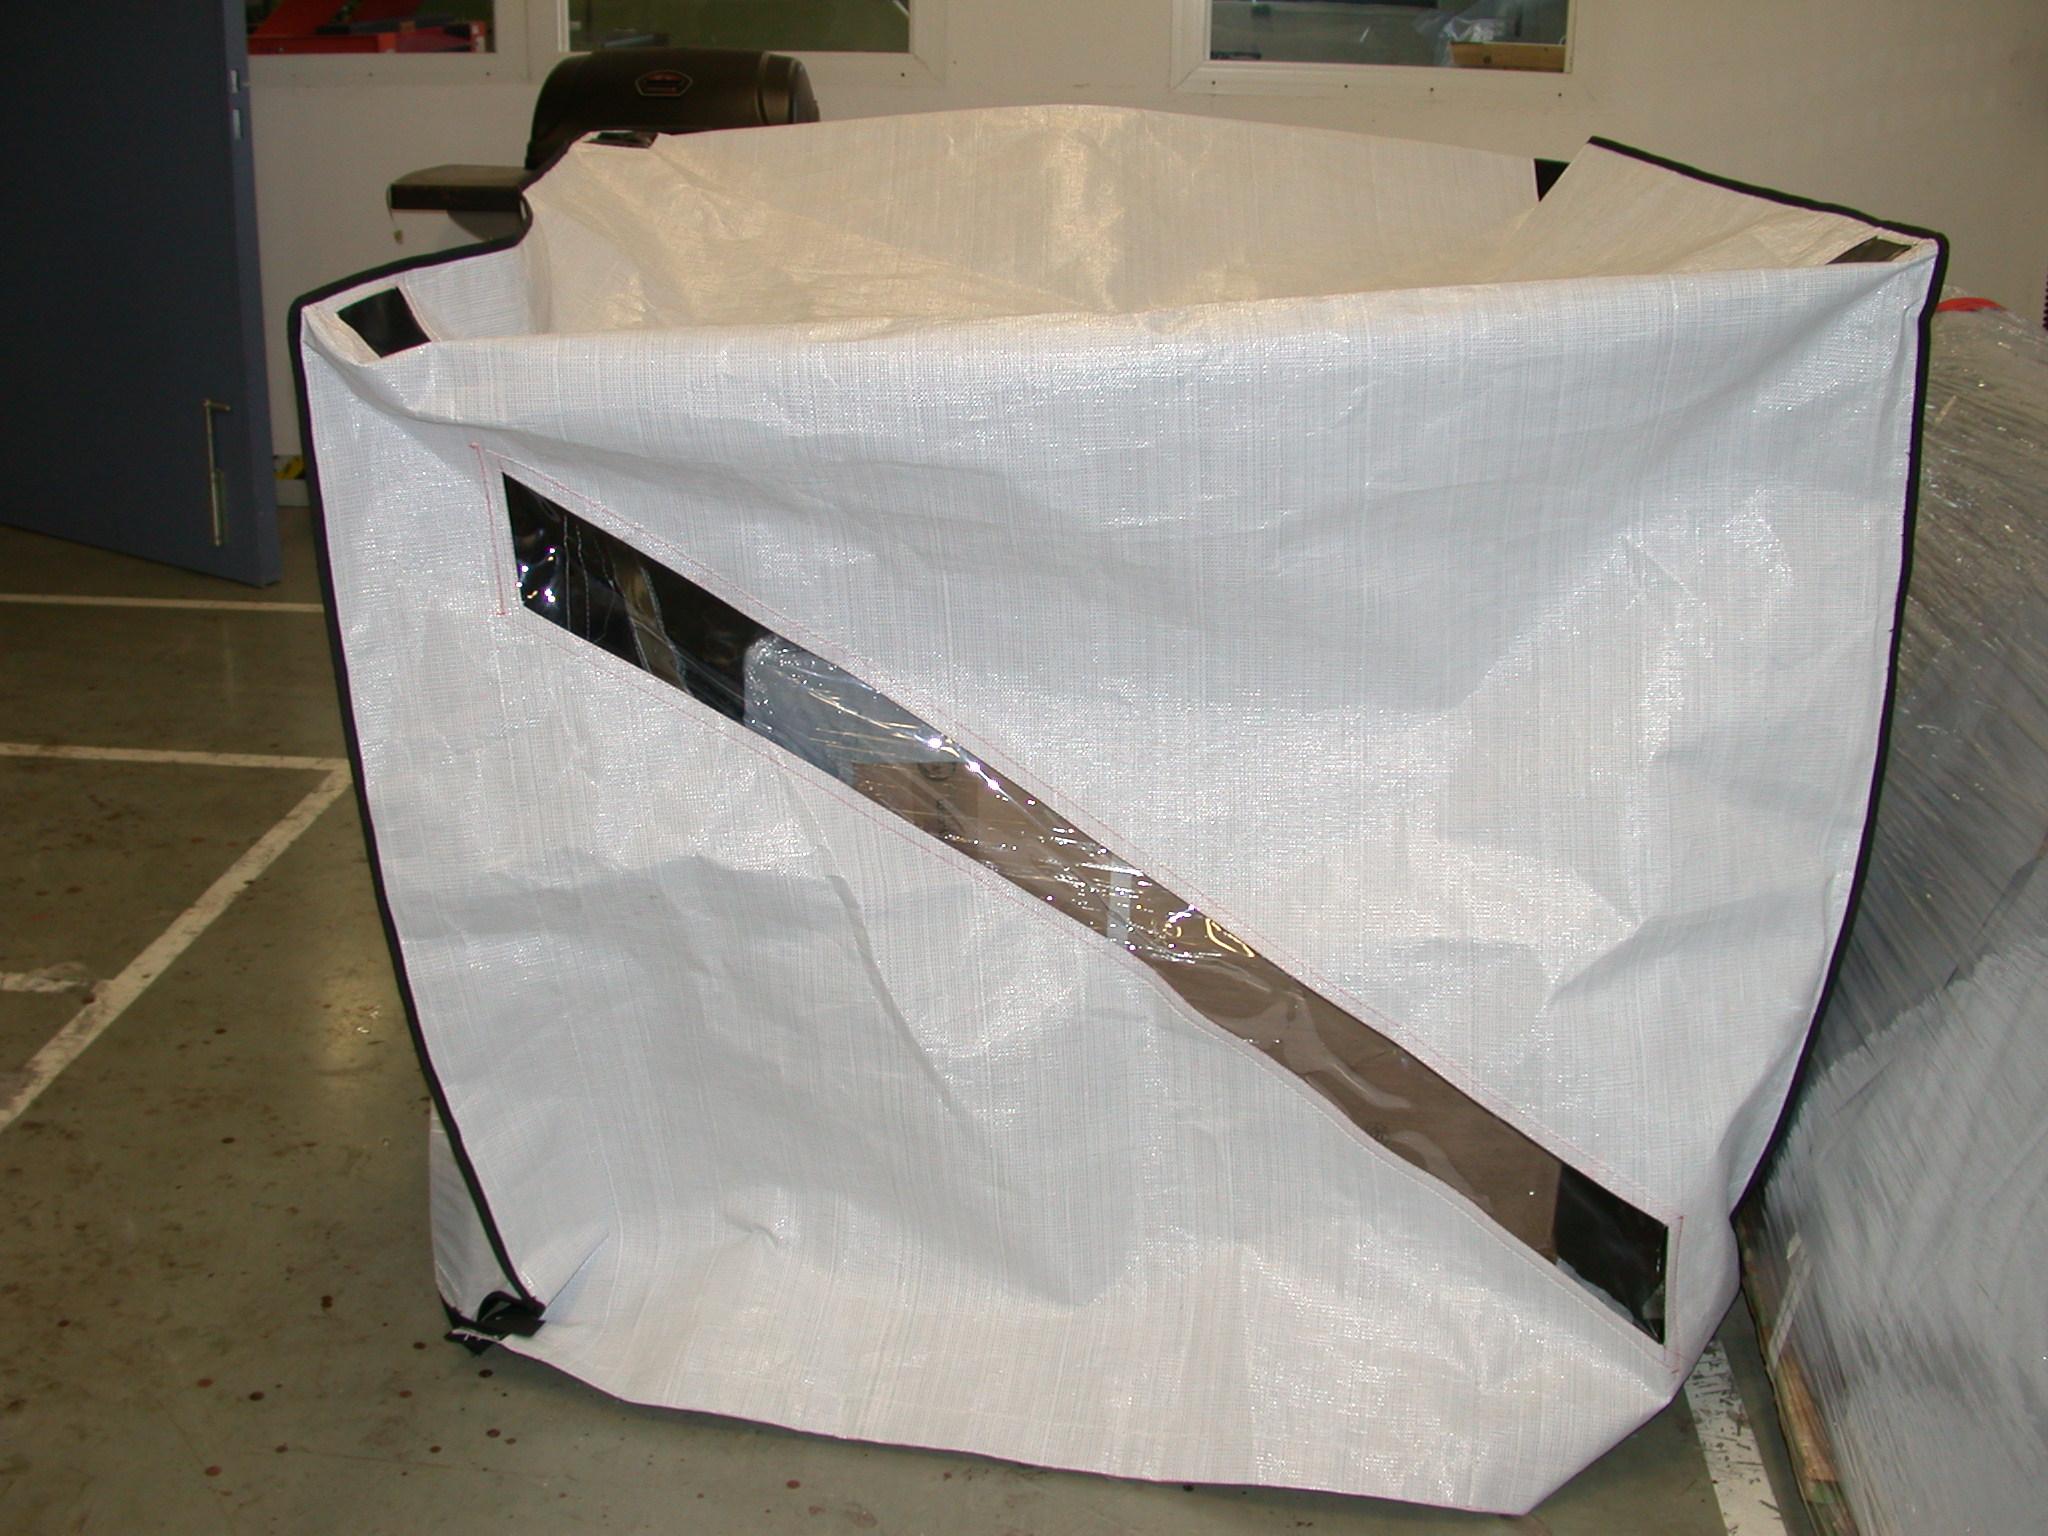 New Intercept Woven Material - Innovative Packaging